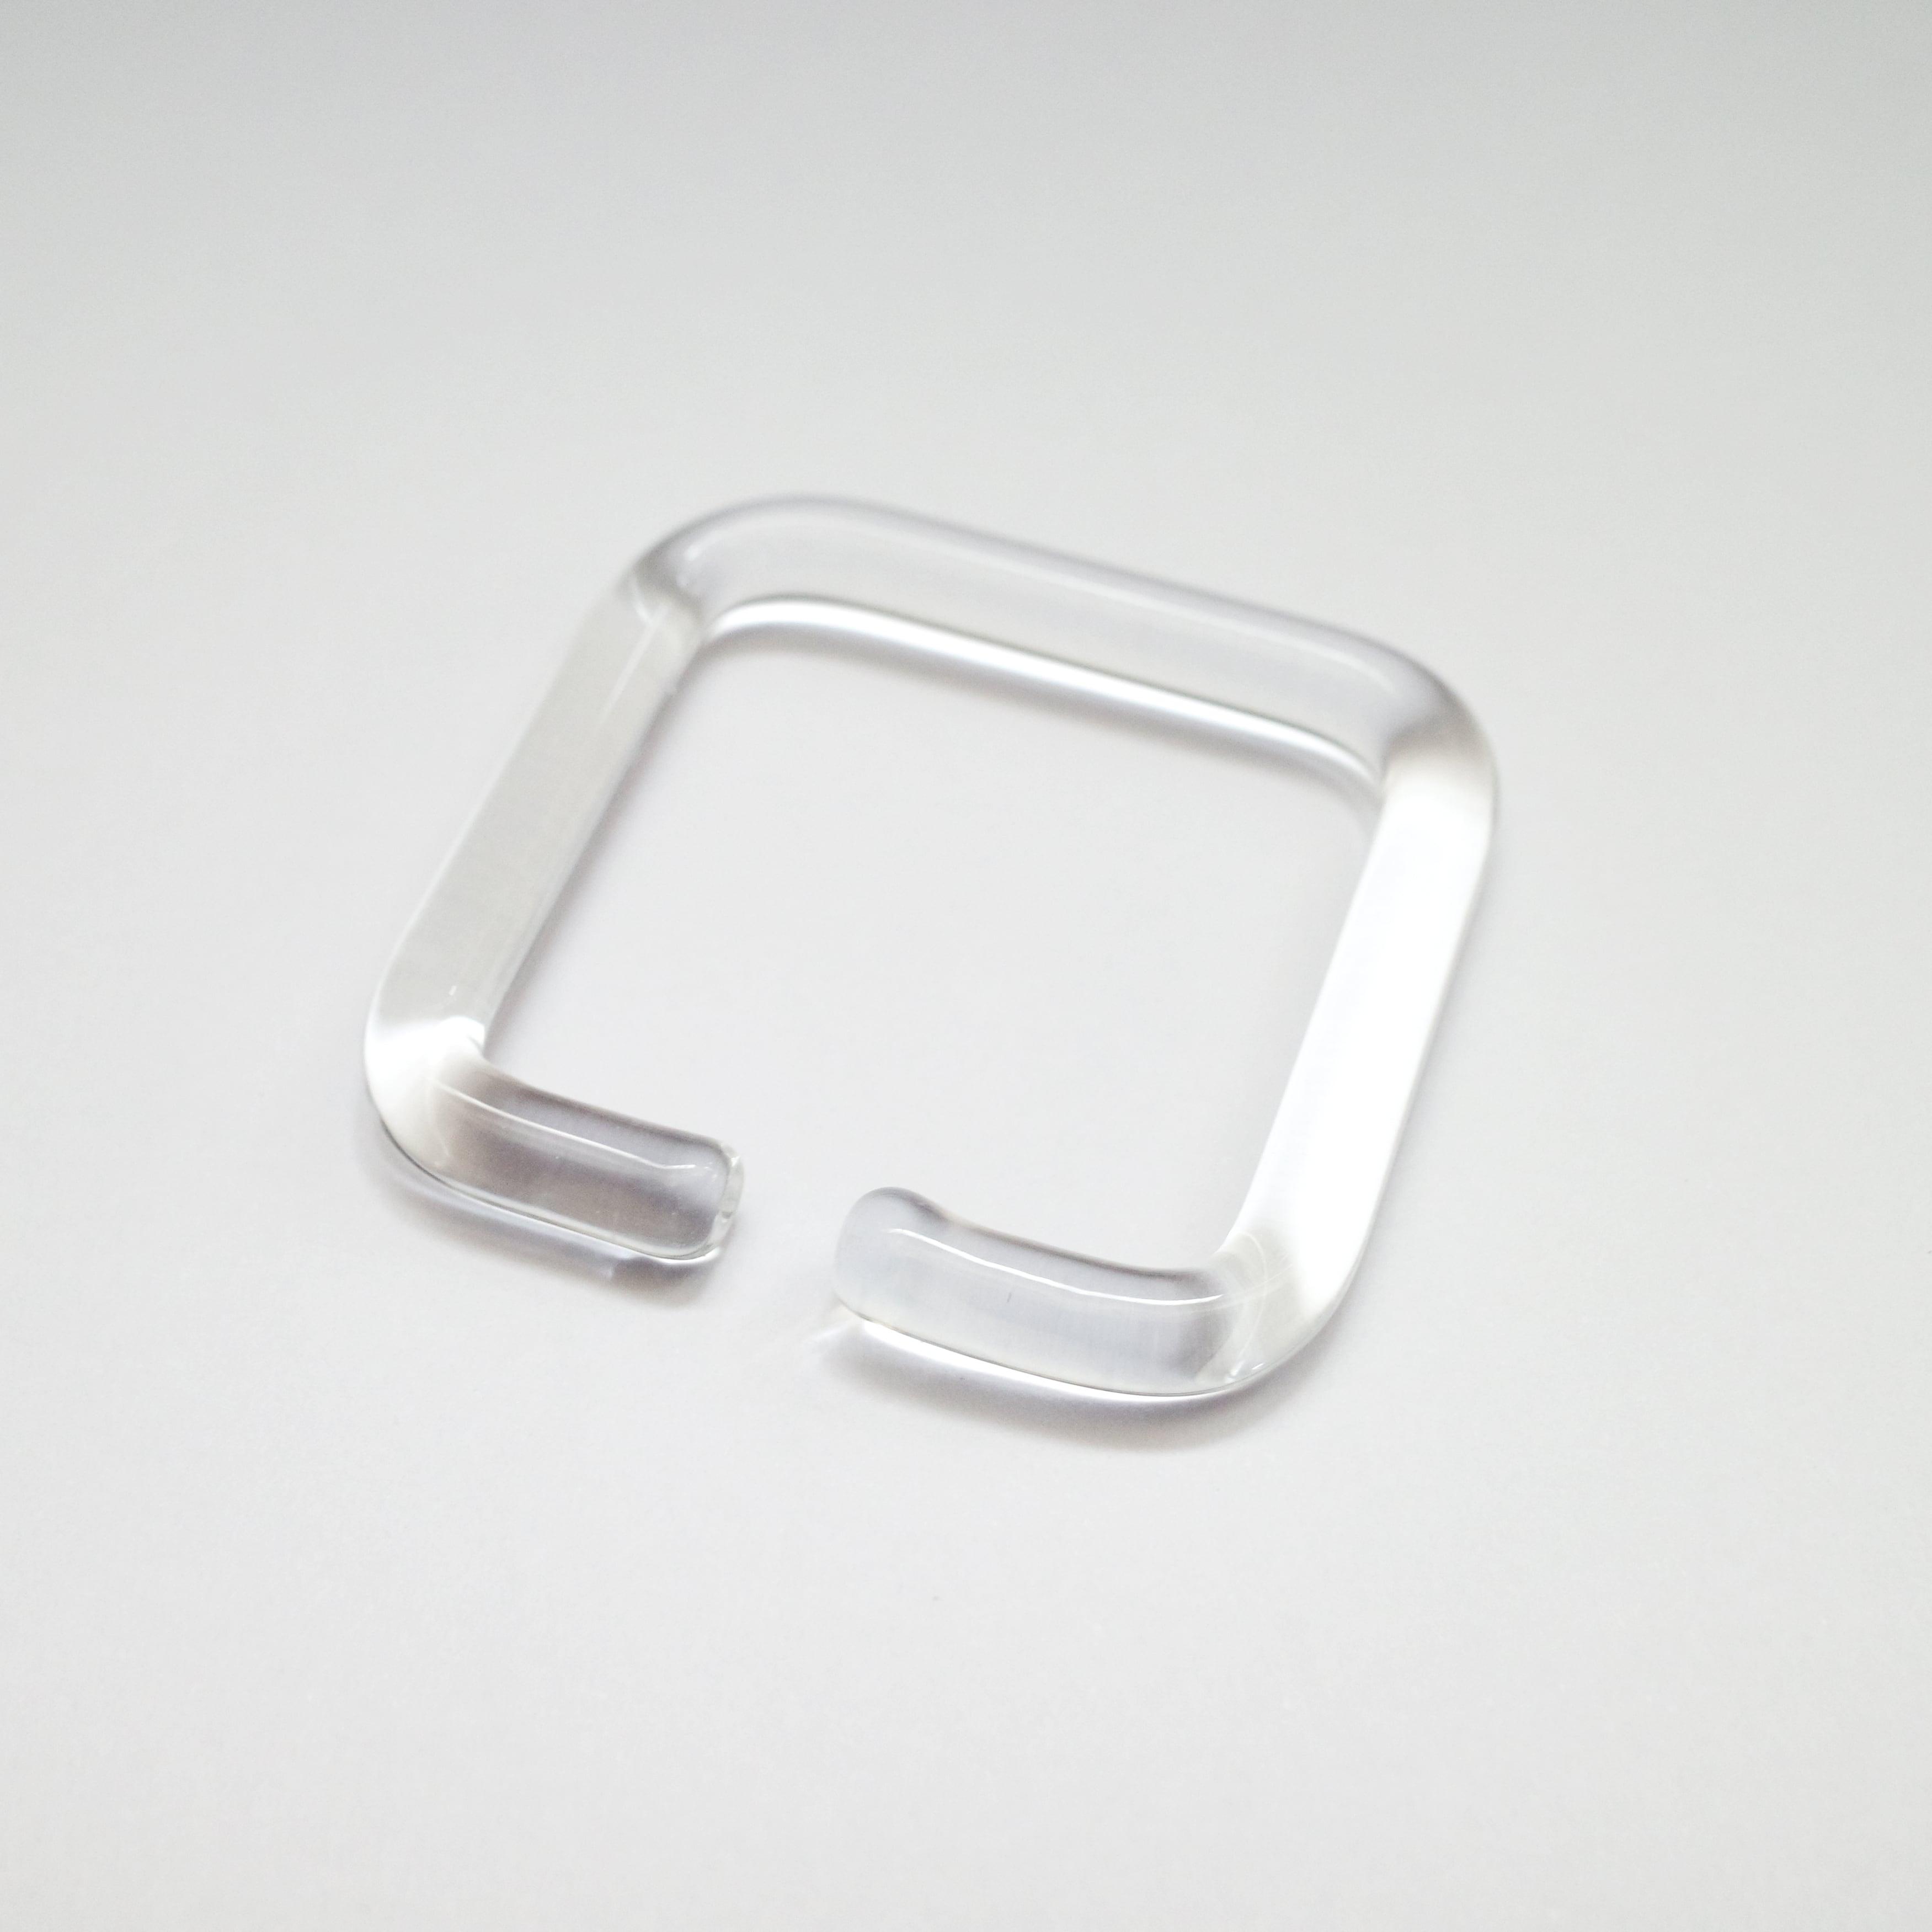 _cthruit シースルーイット ear cuff (S) イヤーカフ □(四角形) 【Clear】